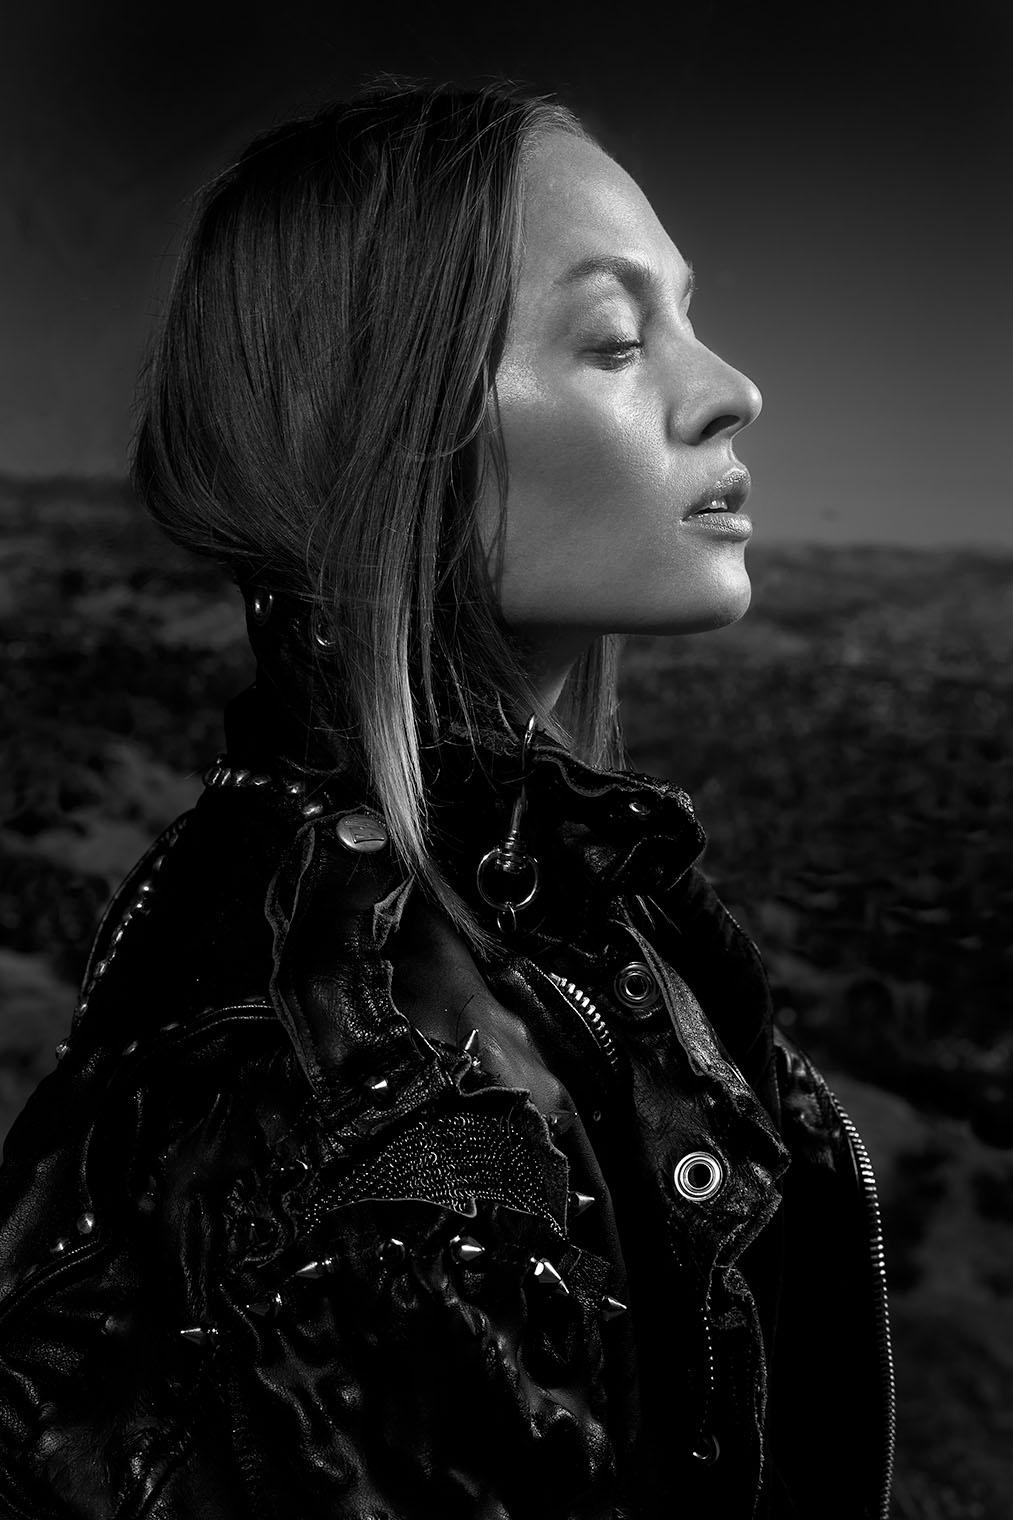 black and white fashion portrait by portrait photographersof Los Angeles